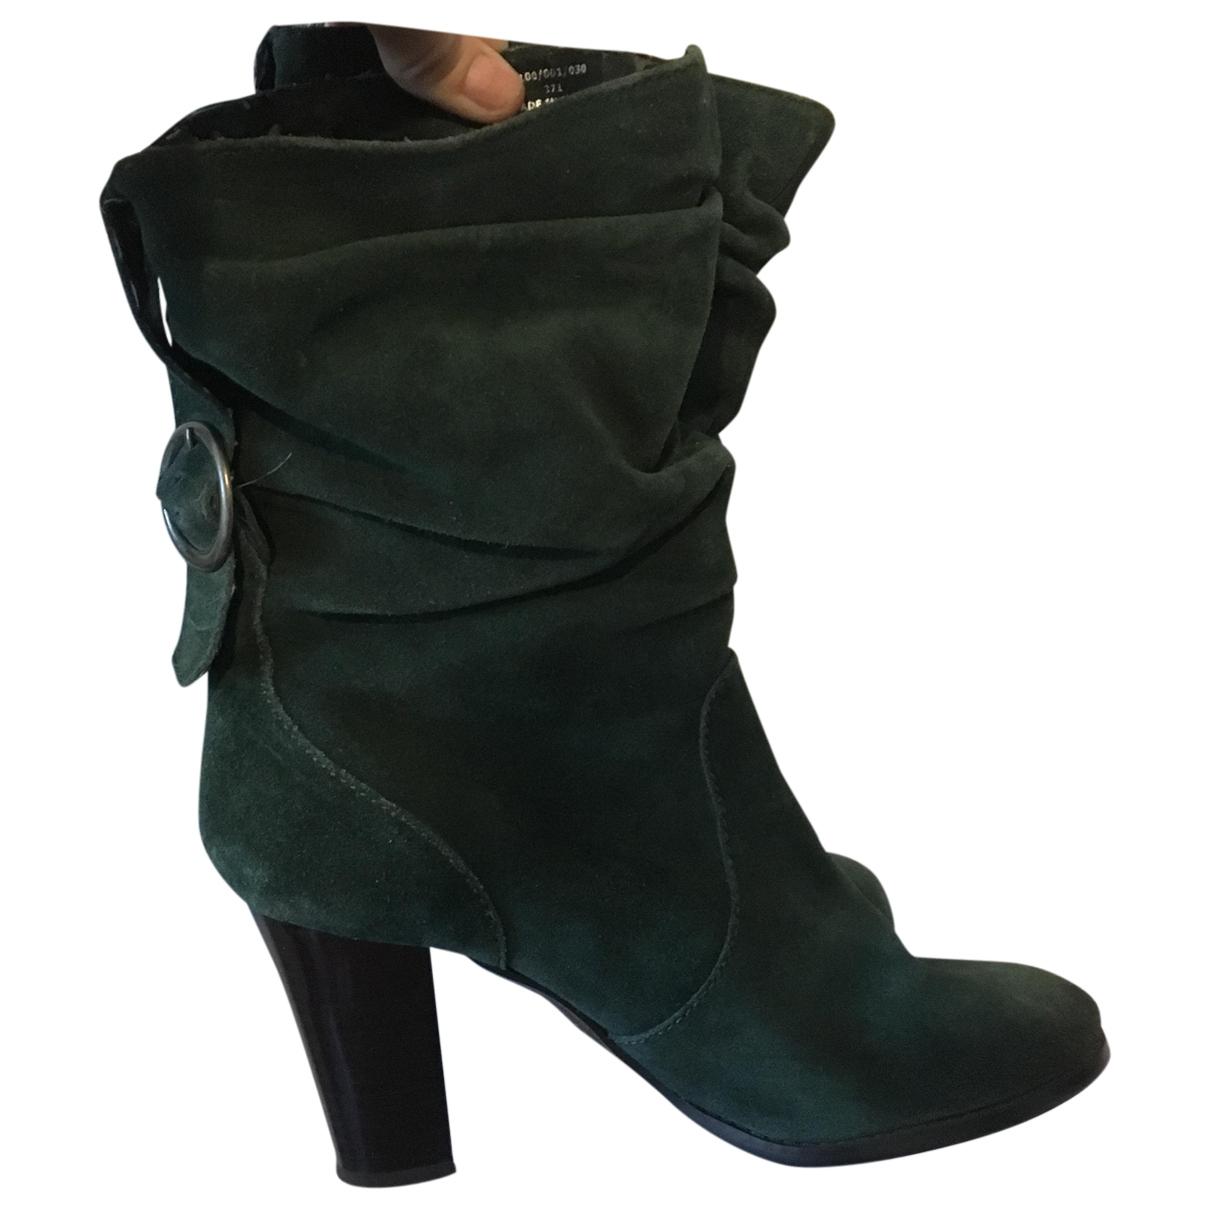 Zara \N Stiefel in  Gruen Veloursleder